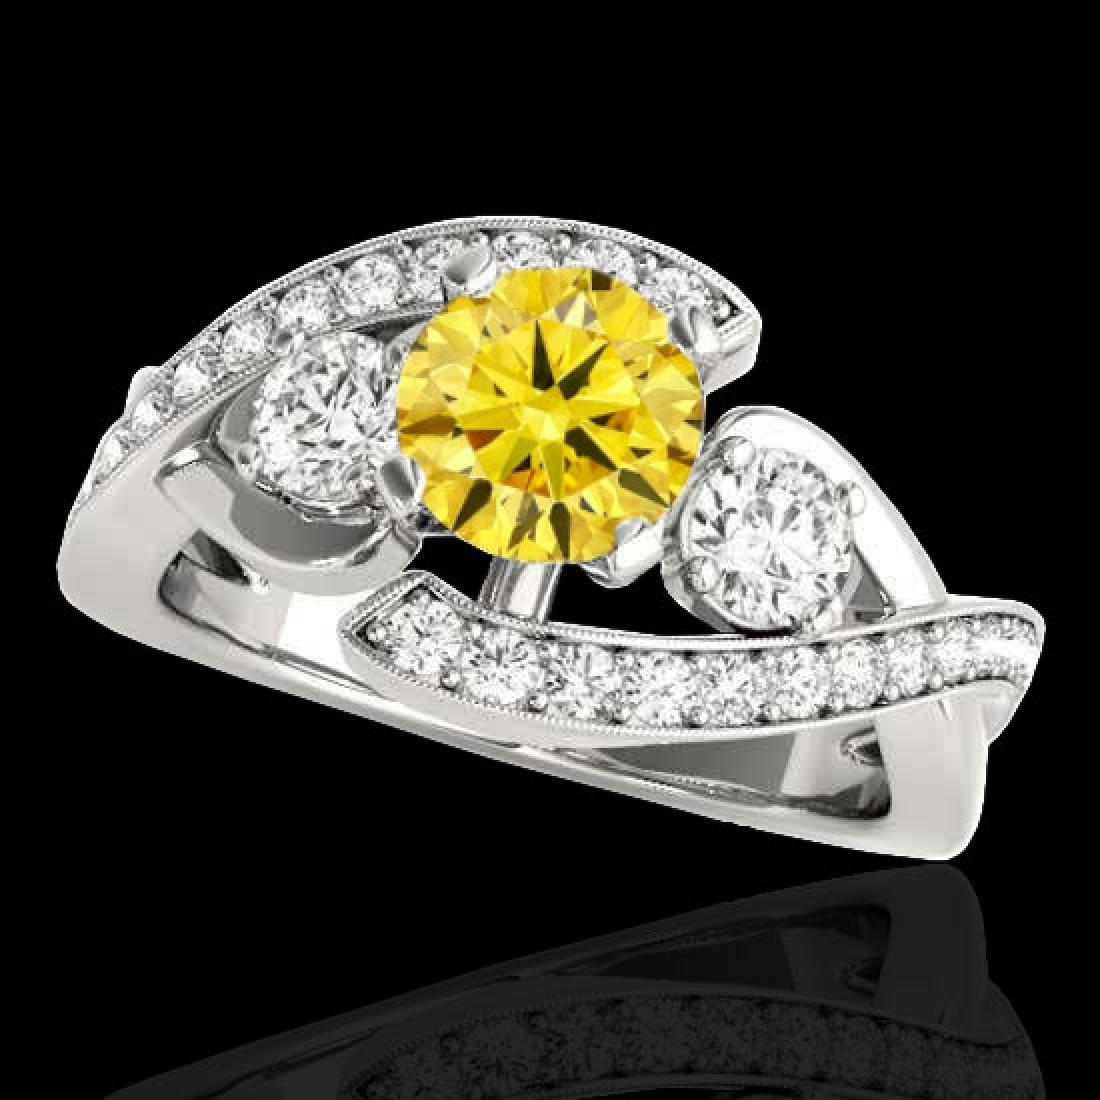 2.01 CTW Certified Si Intense Yellow Diamond Bypass